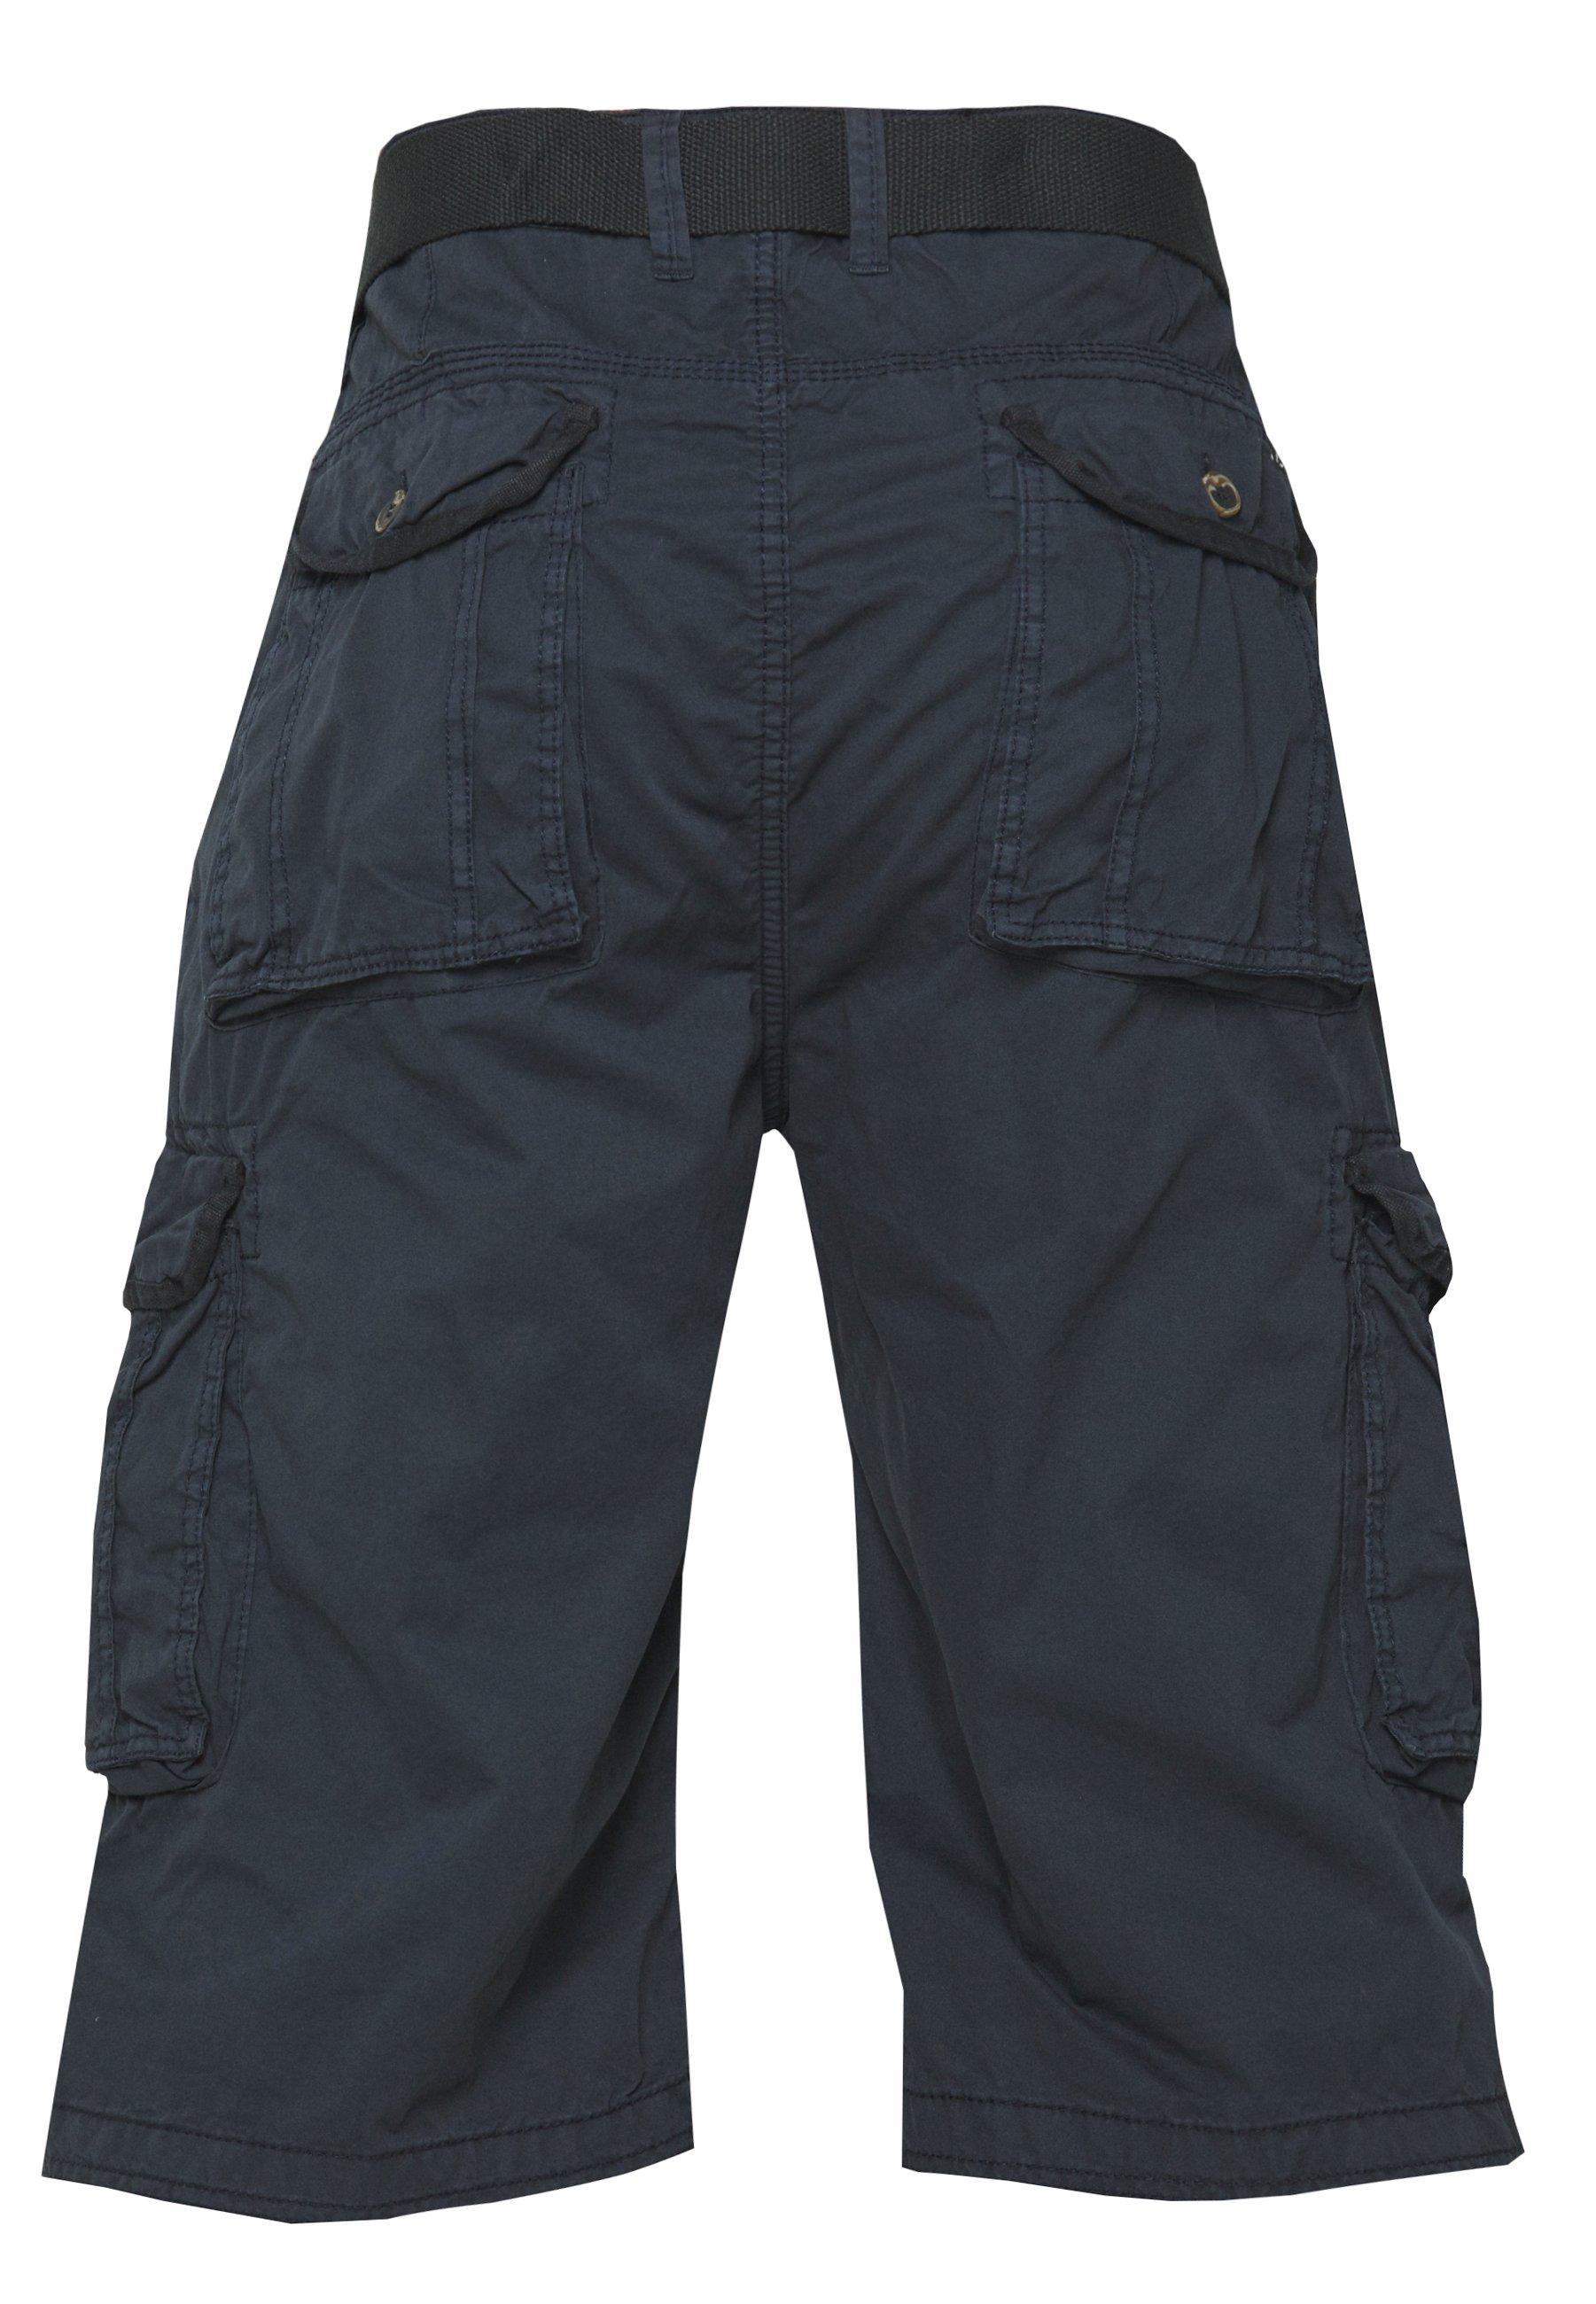 Cars Jeans Durras Plus - Shorts Navy